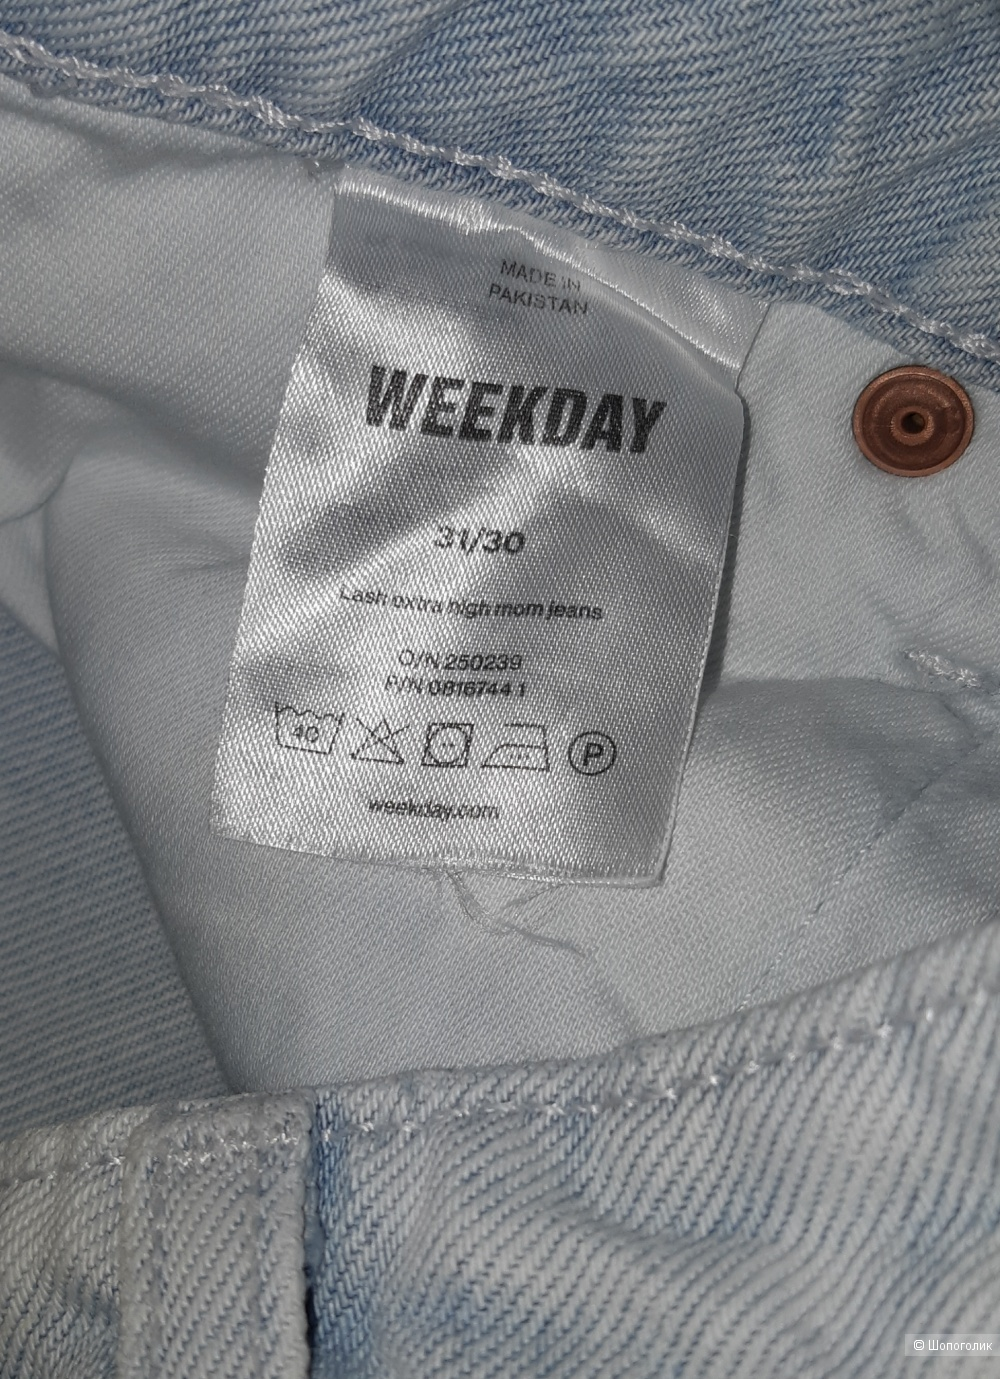 Джинсы weekday, размер 31/30